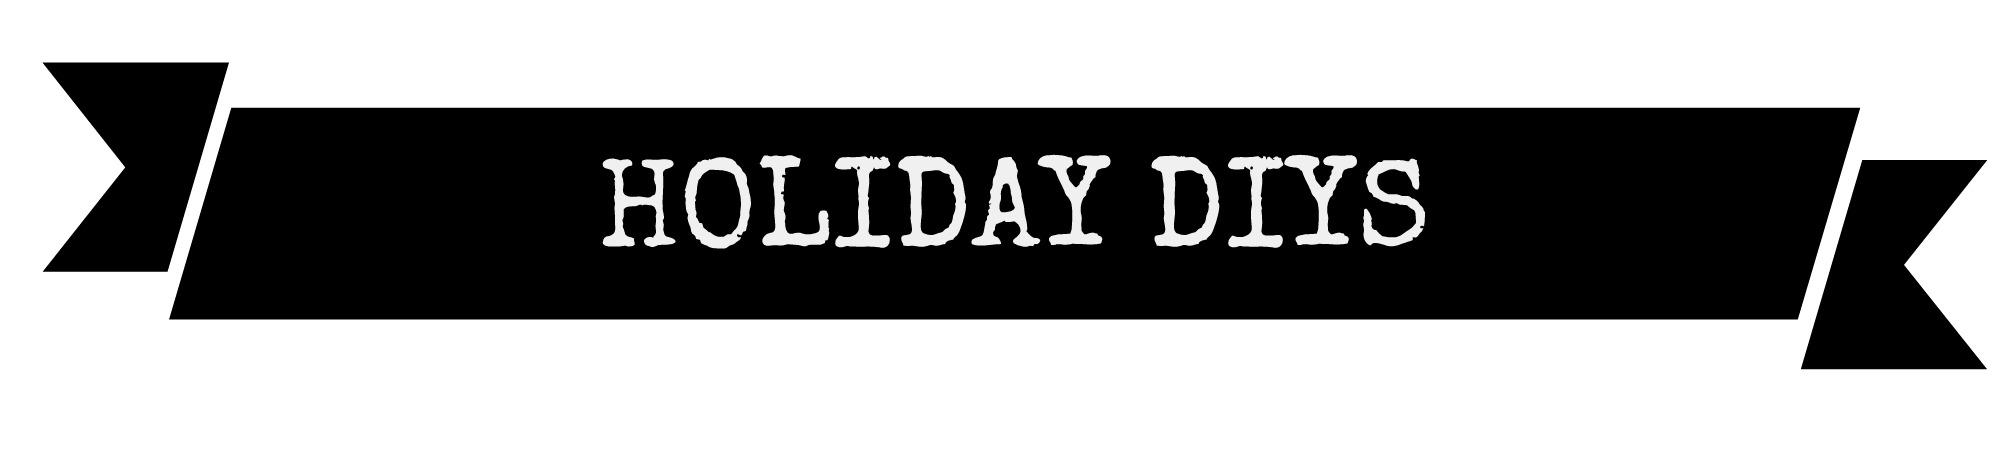 holiday-diys